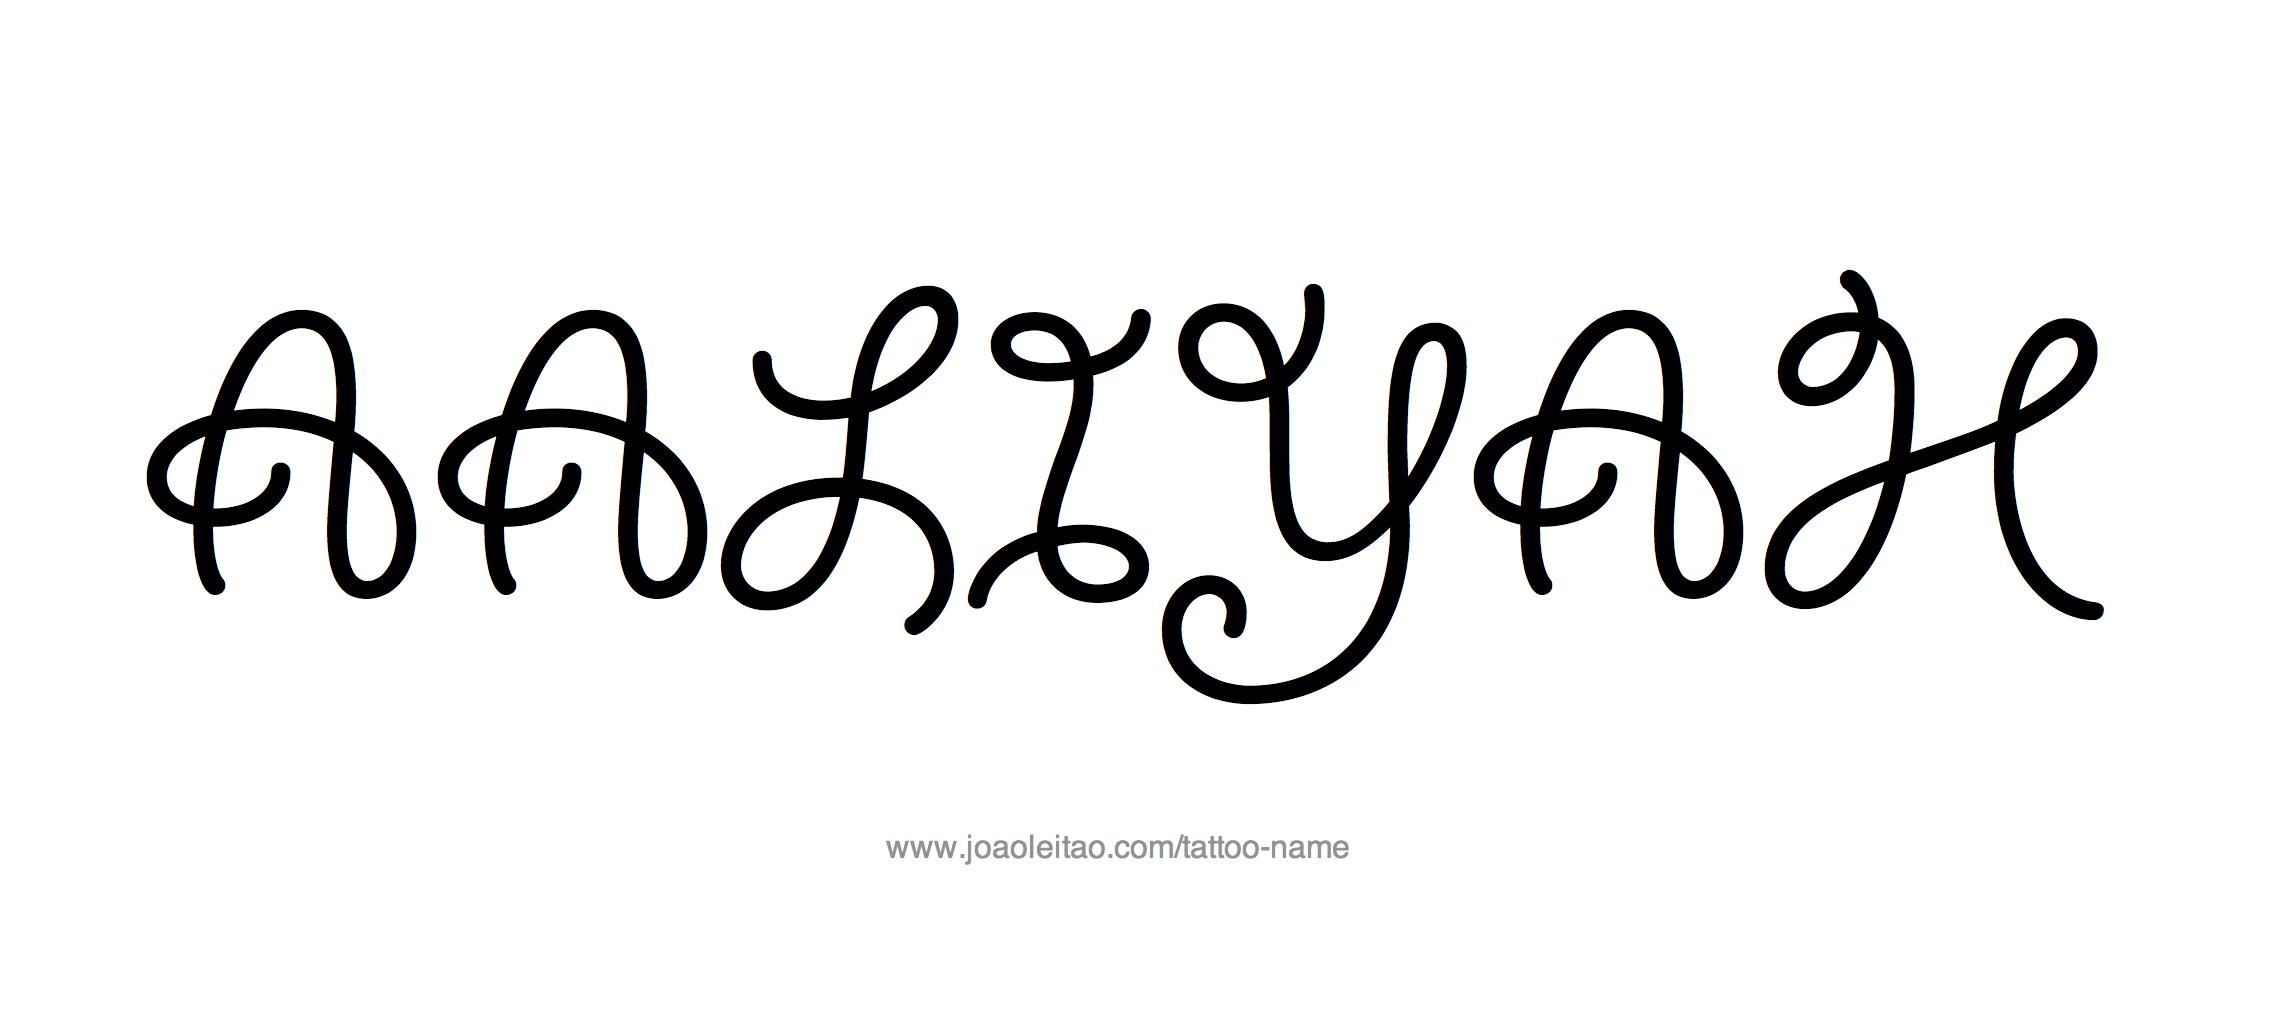 aaliyah name tattoo designs. Black Bedroom Furniture Sets. Home Design Ideas